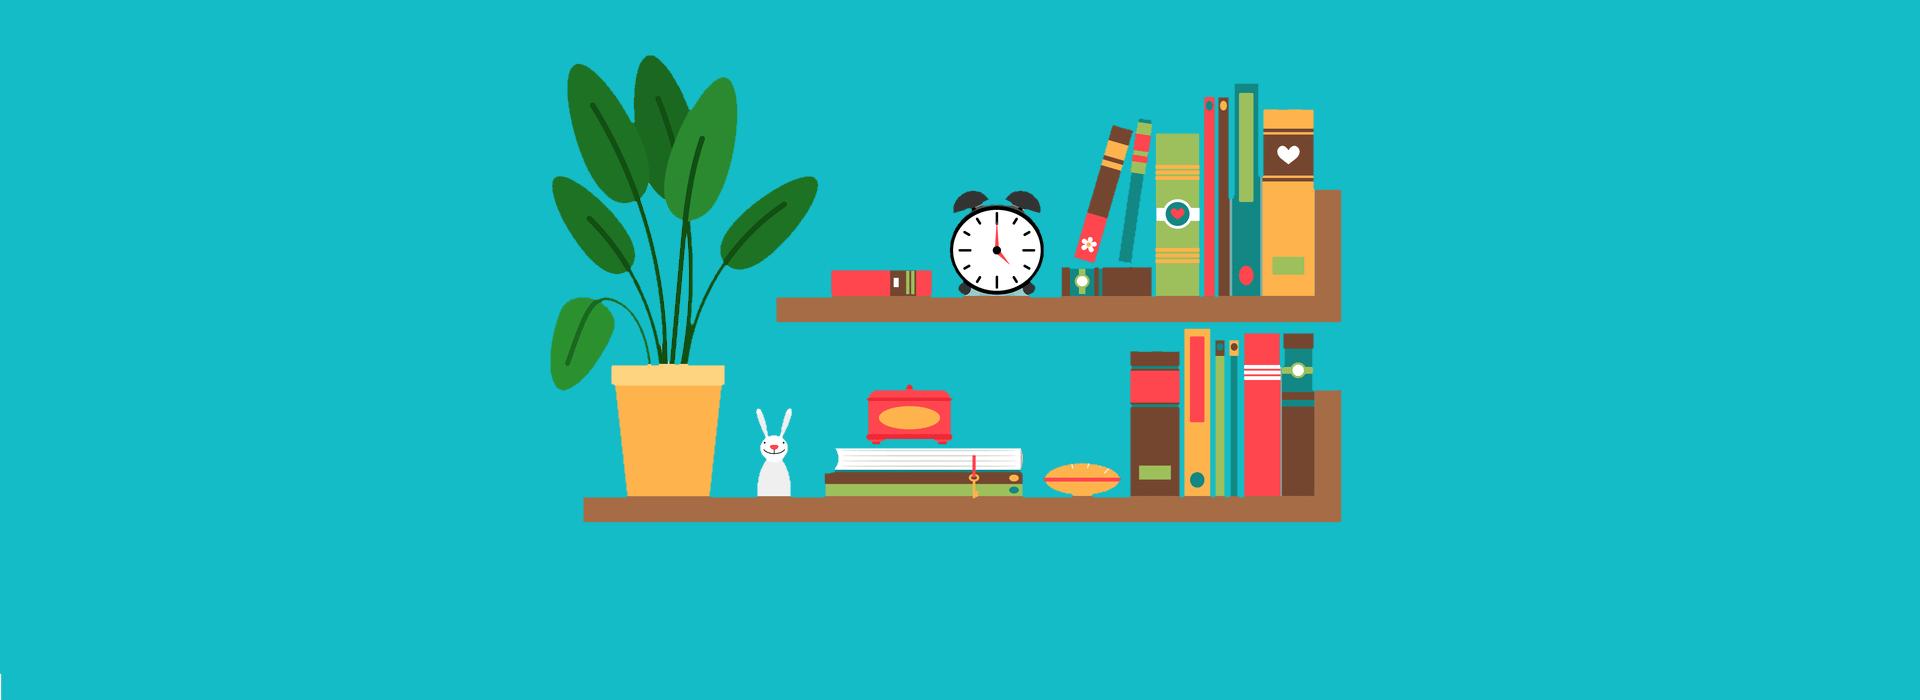 slider-bookshelf